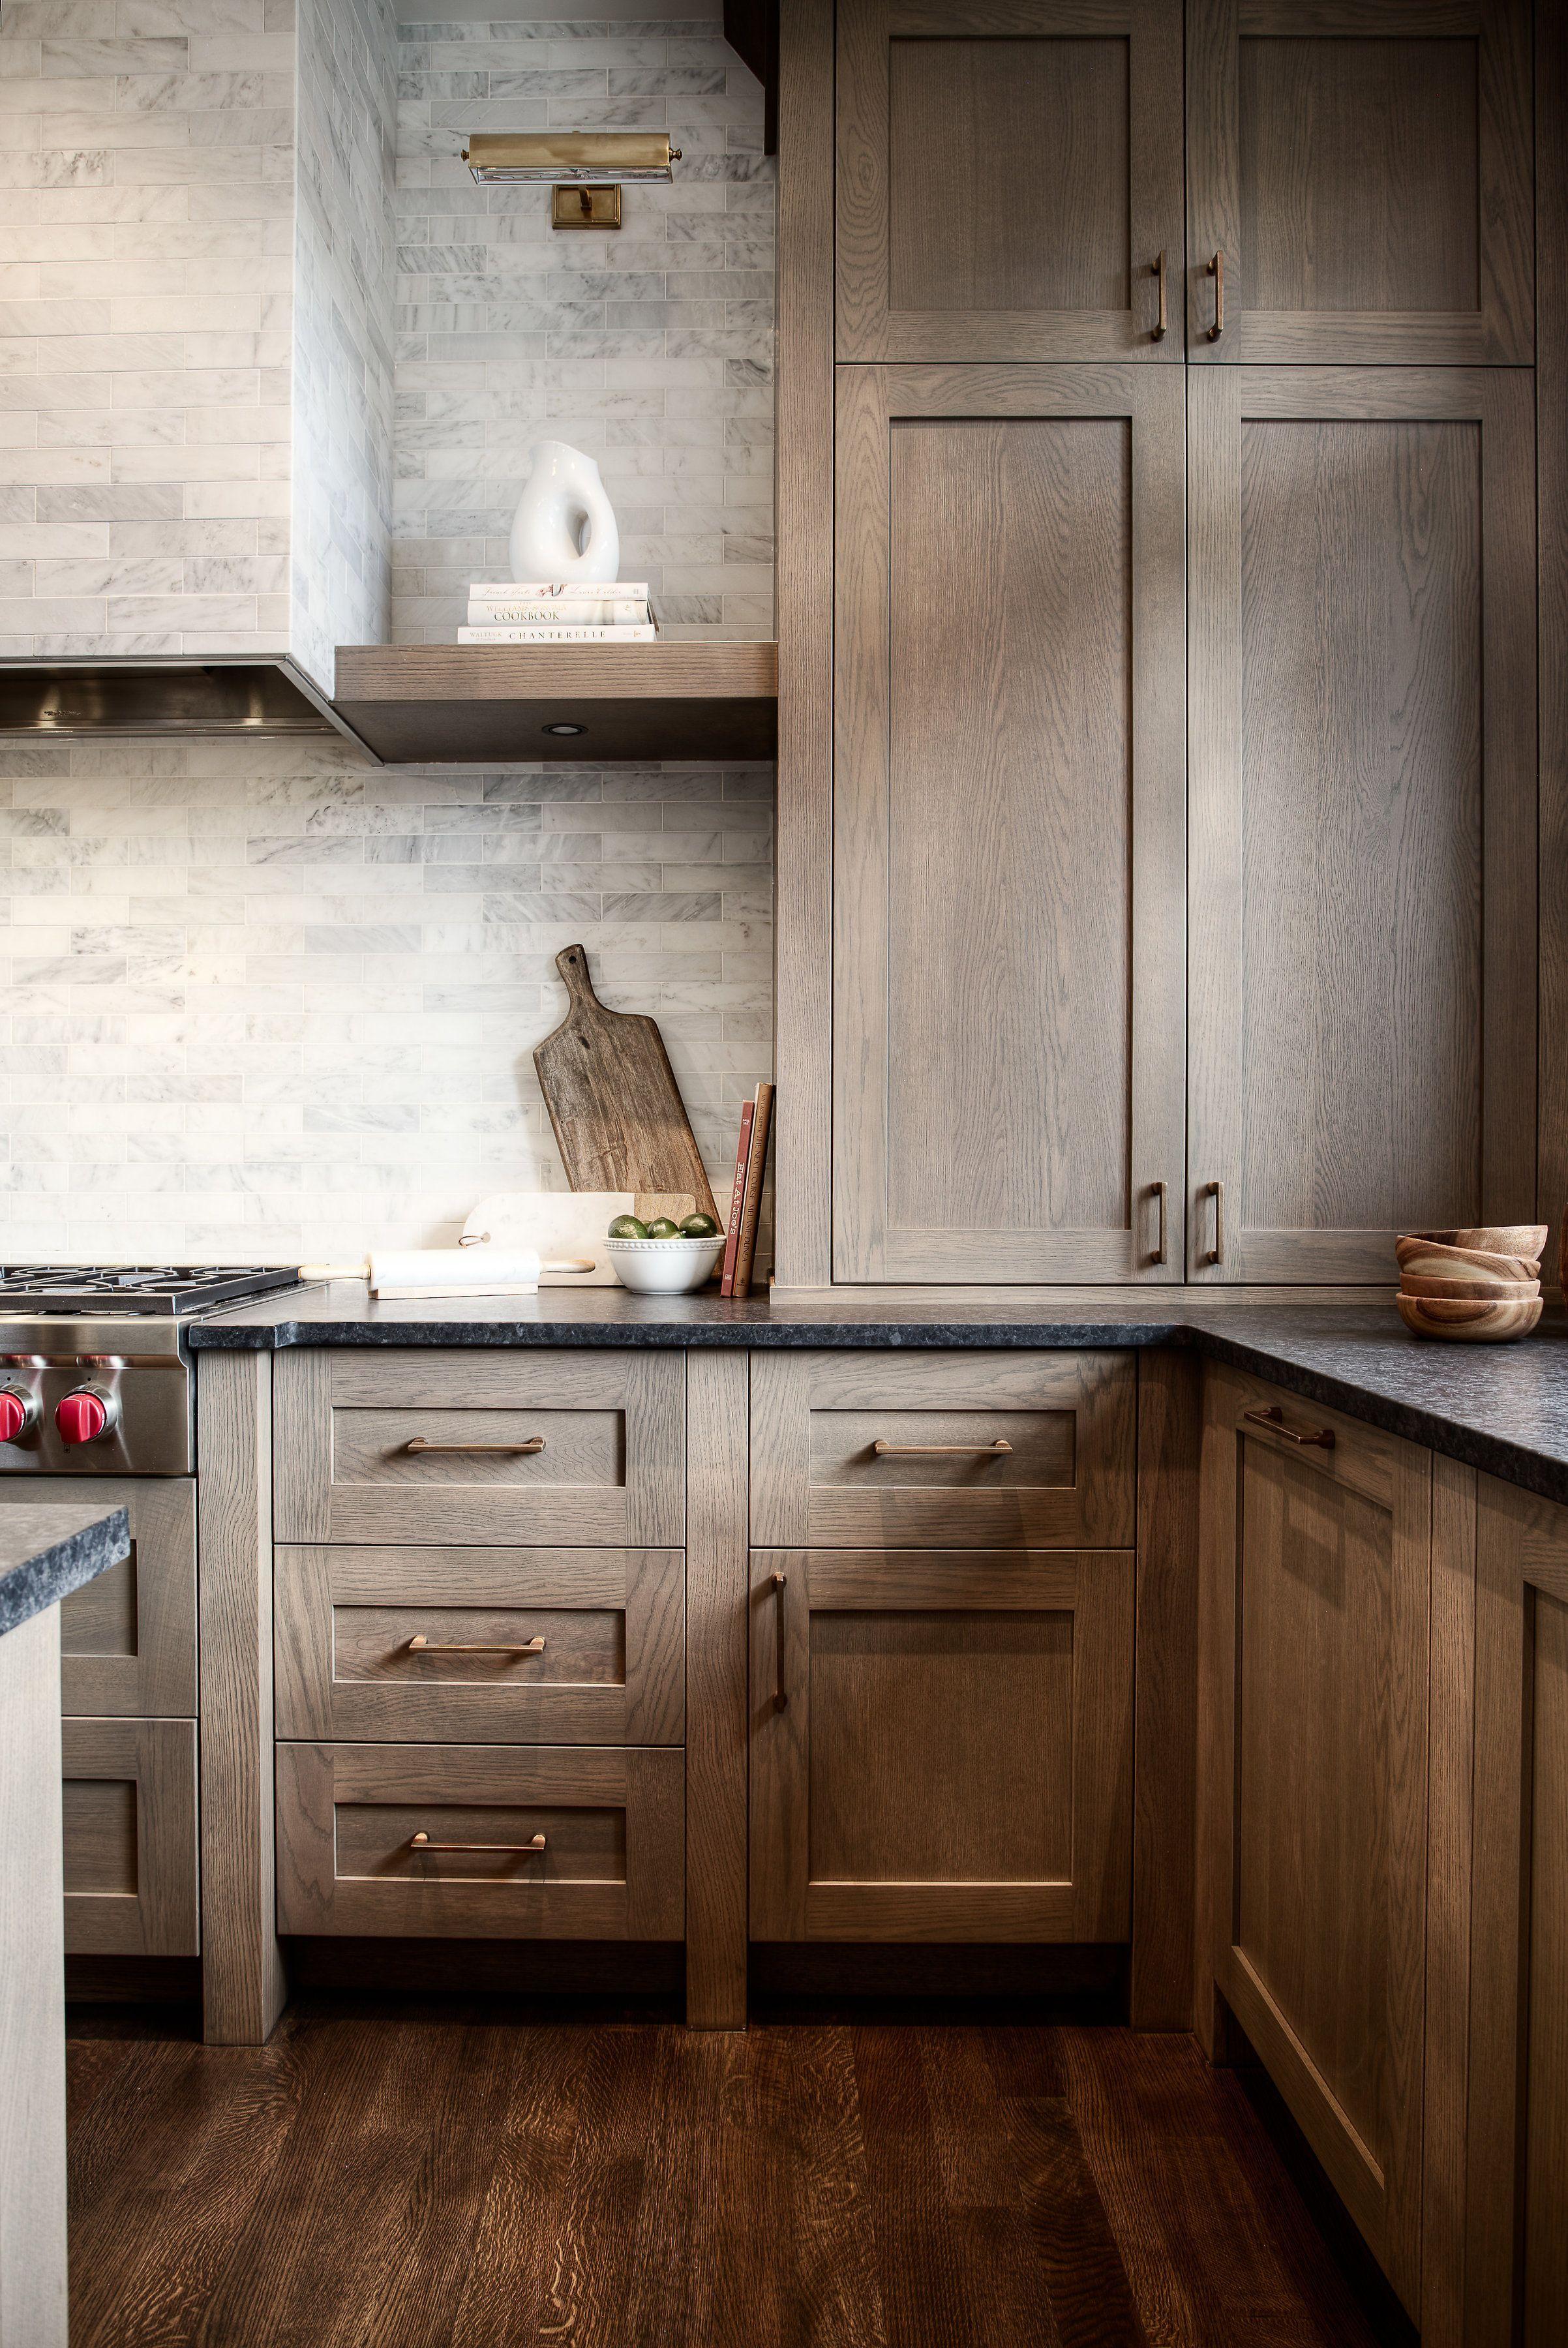 Elboya Custom Kitchen By Veranda Estate Homes Inc Woodencountertops Rustic Kitchen Cabinets Kitchen Cabinet Styles Black Kitchen Countertops